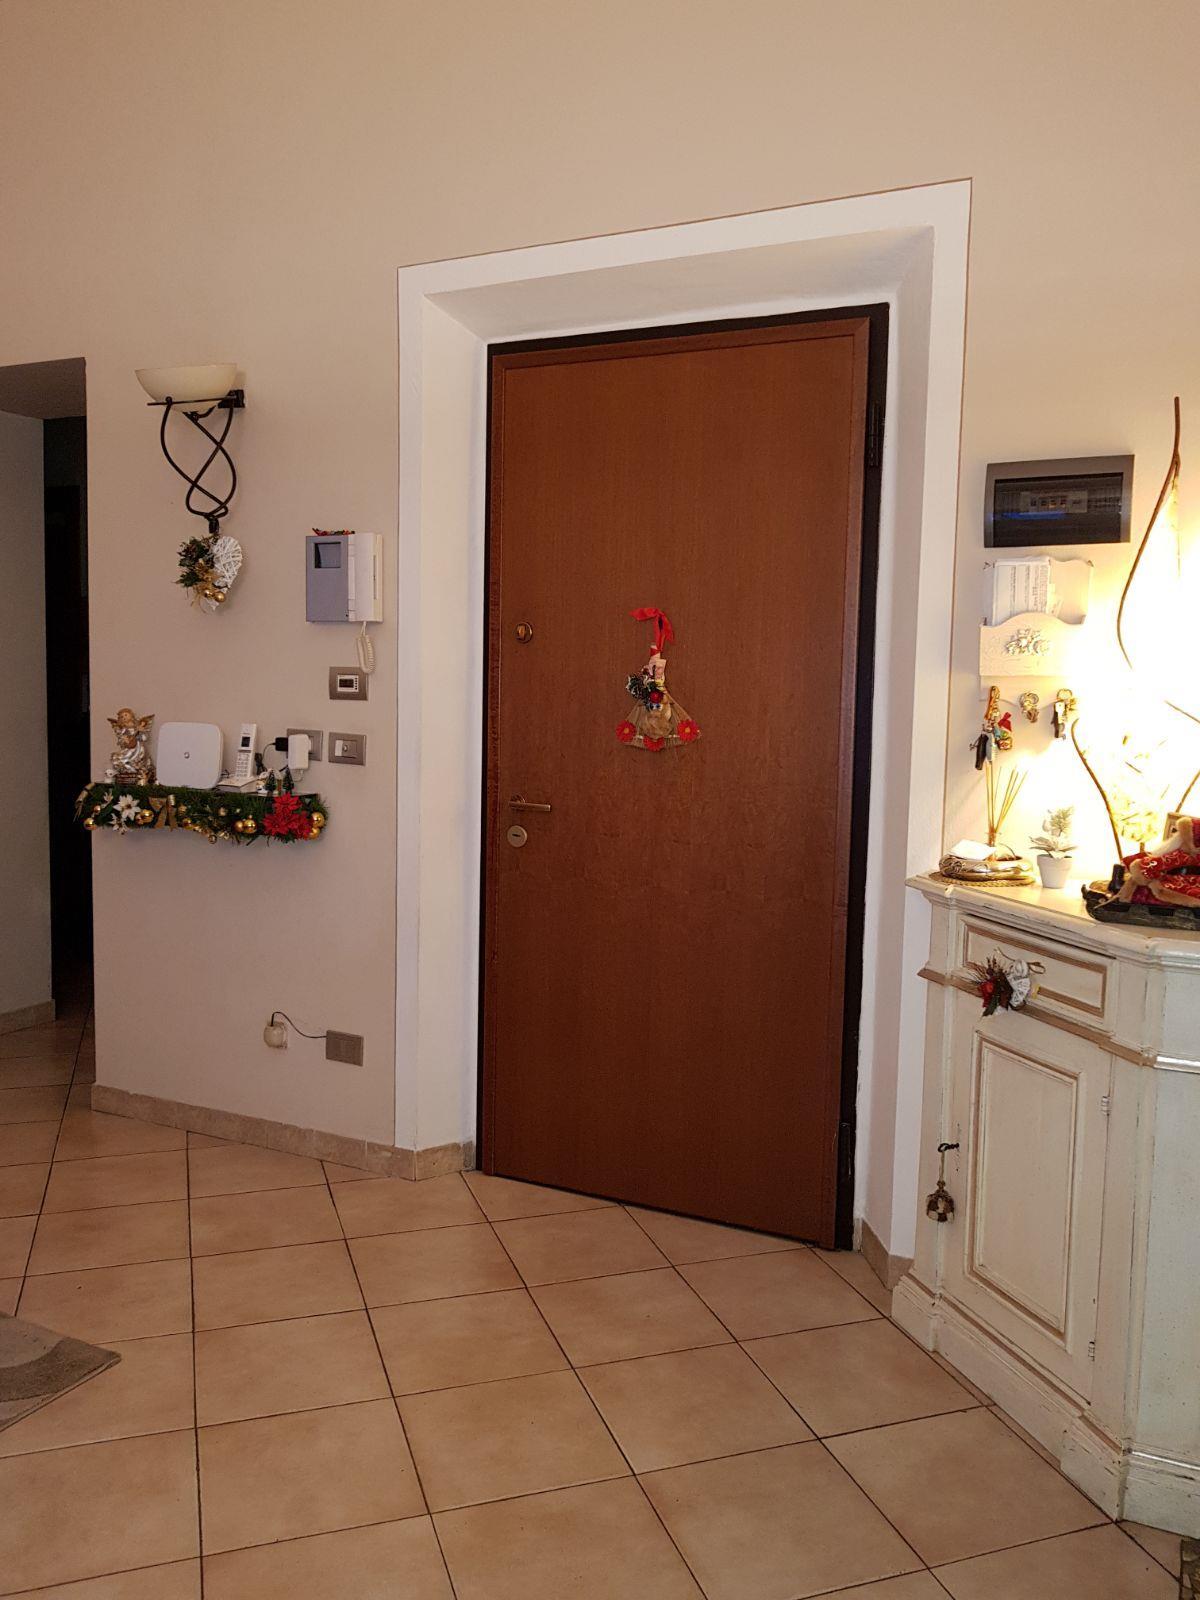 3 Vani MONTECATINI TERME (PT) Appartamento indipendente con resede esclusivo.